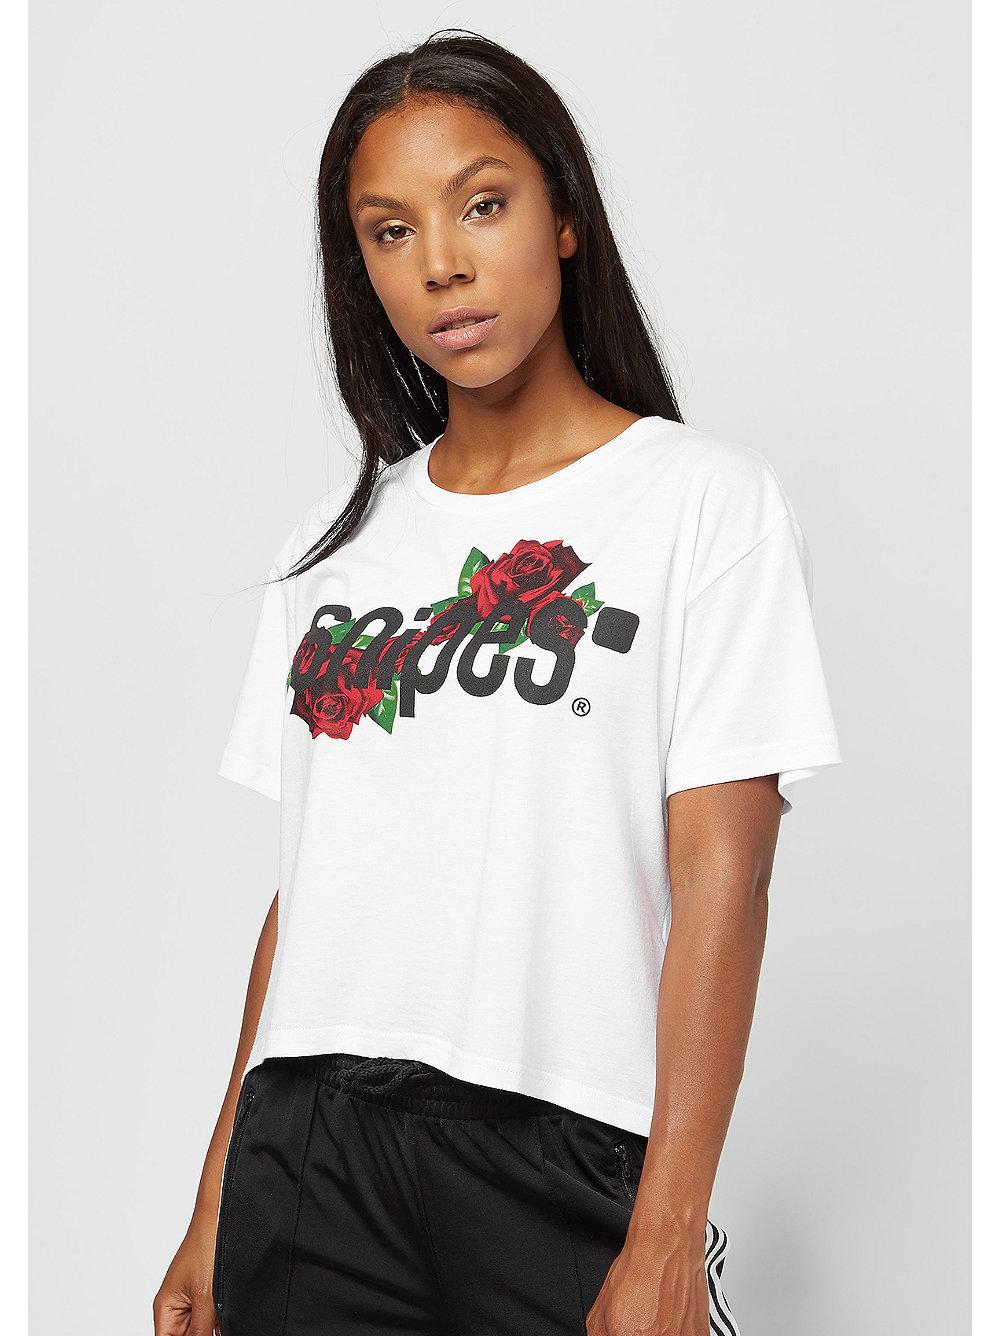 Roses Basic Logo white